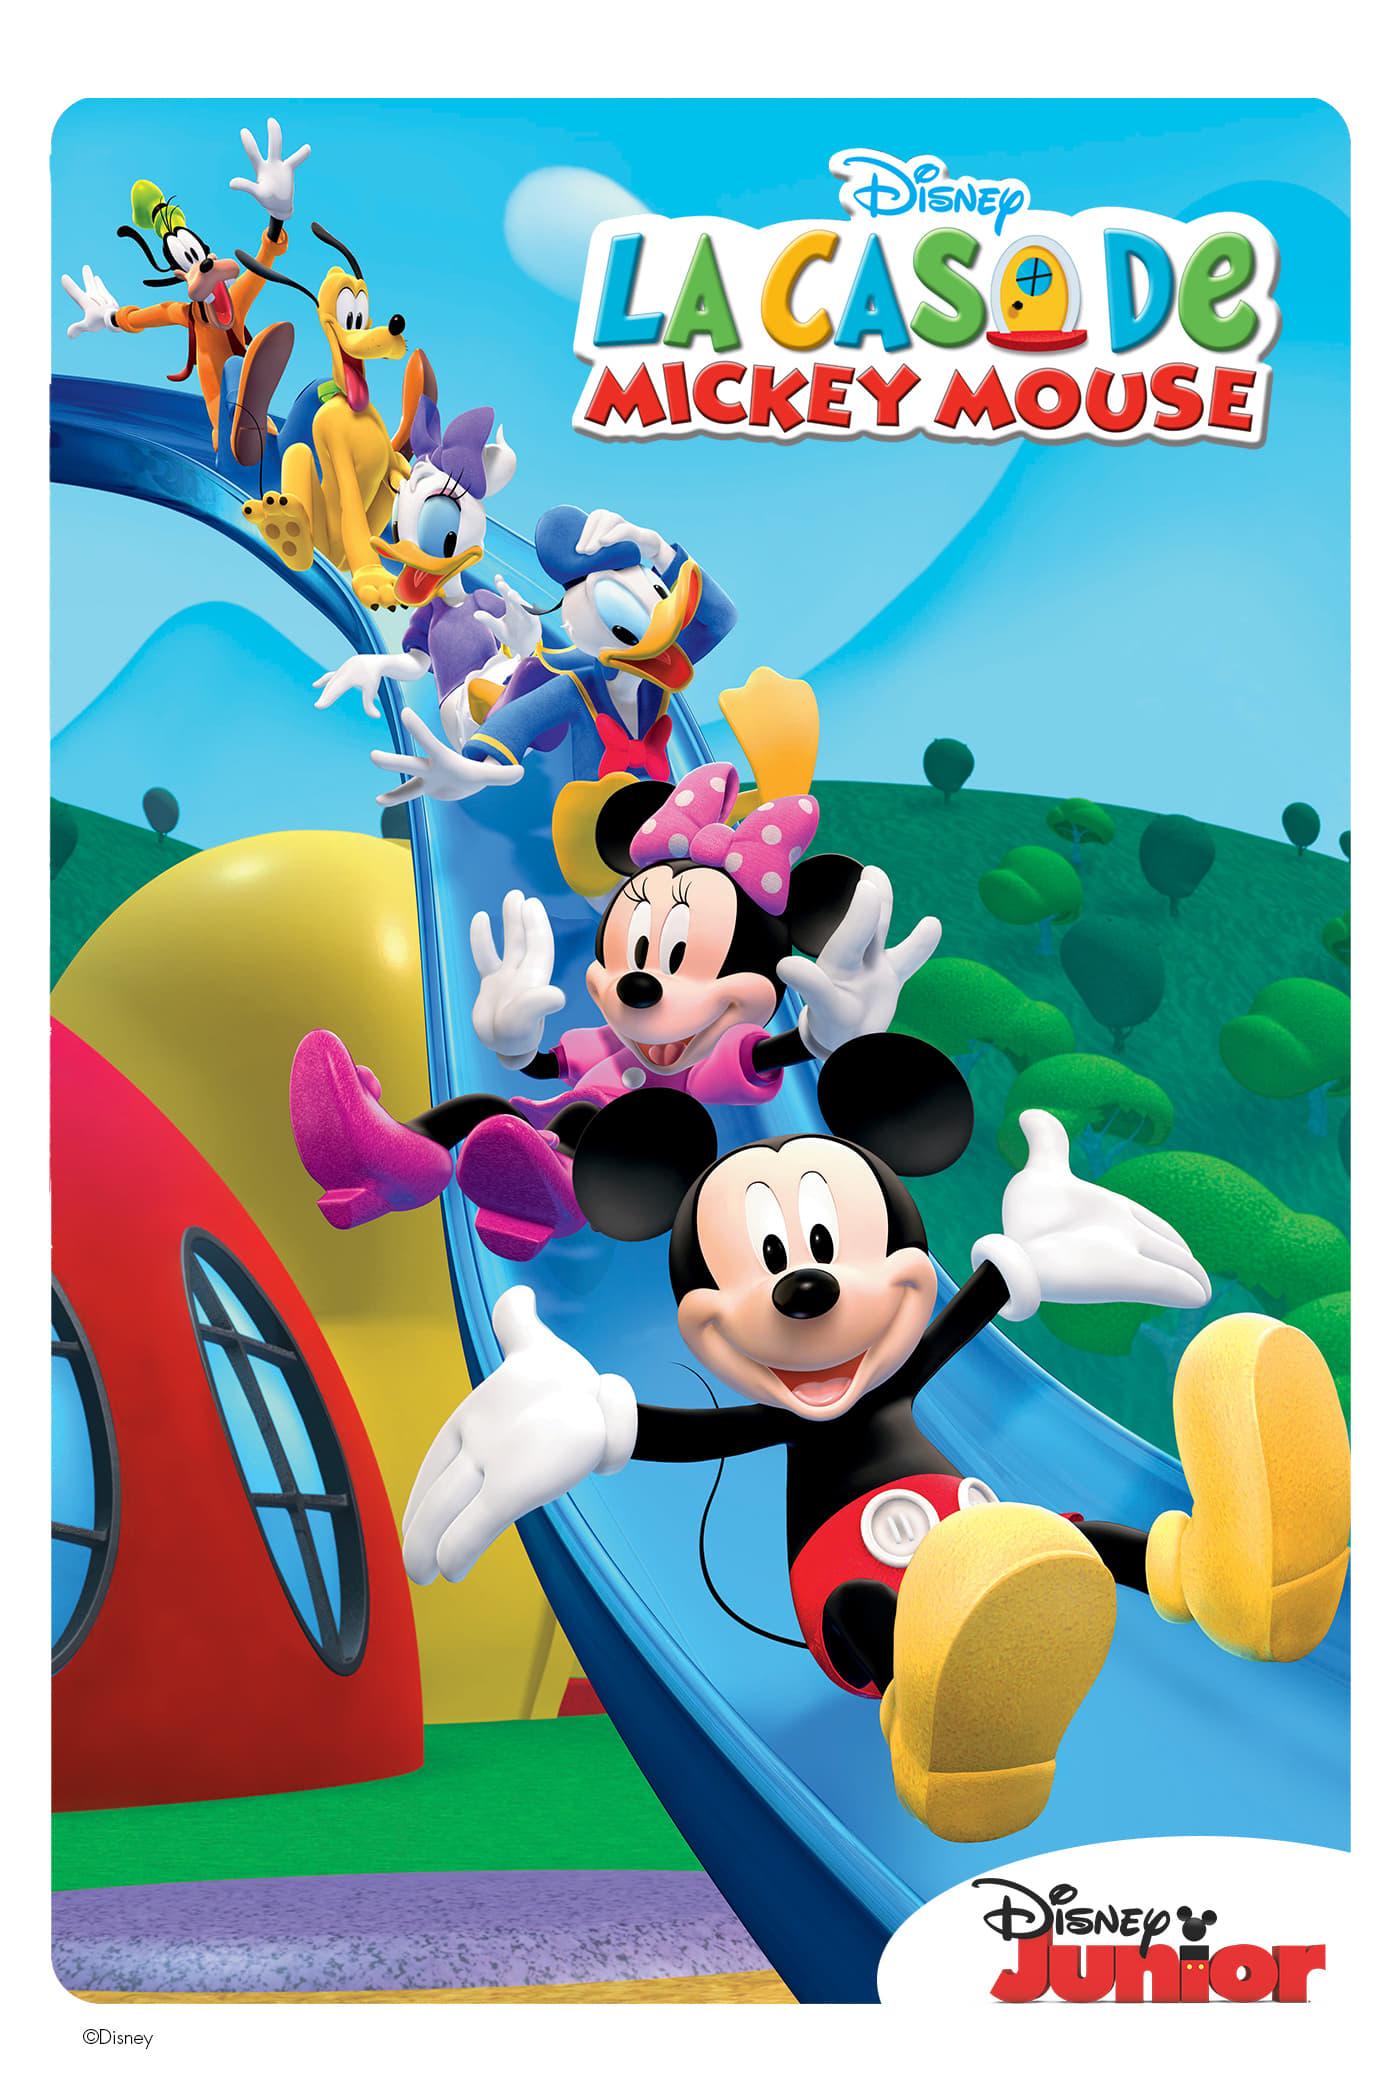 La casa de Mickey Mouse poster